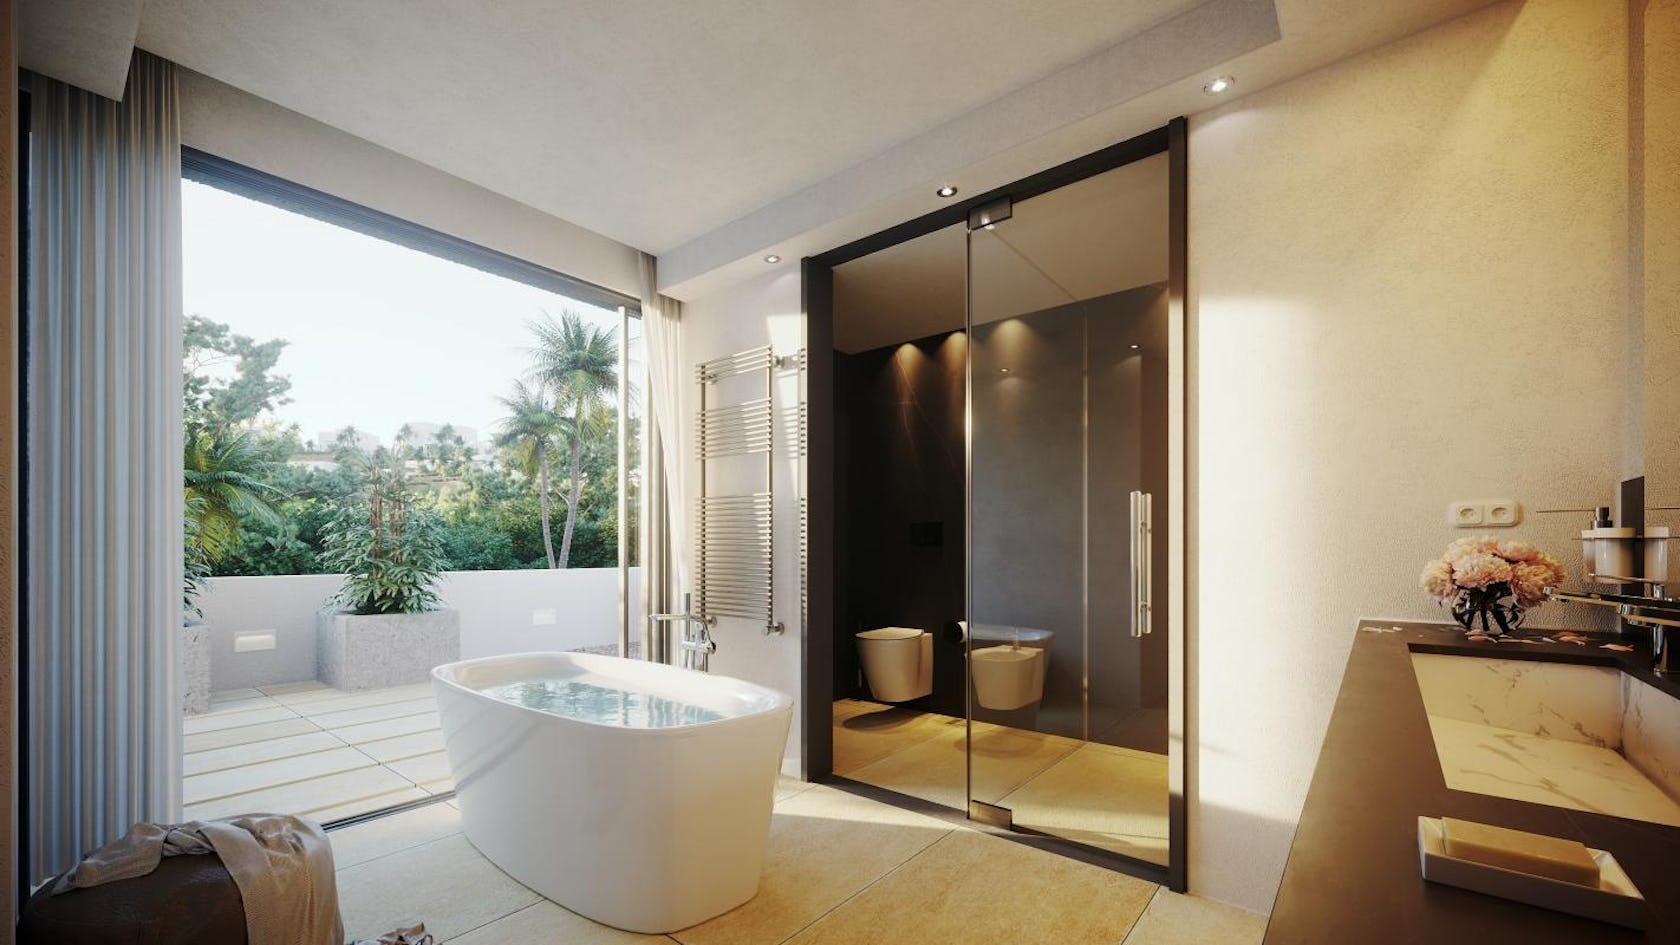 tub bathtub interior design indoors flooring room